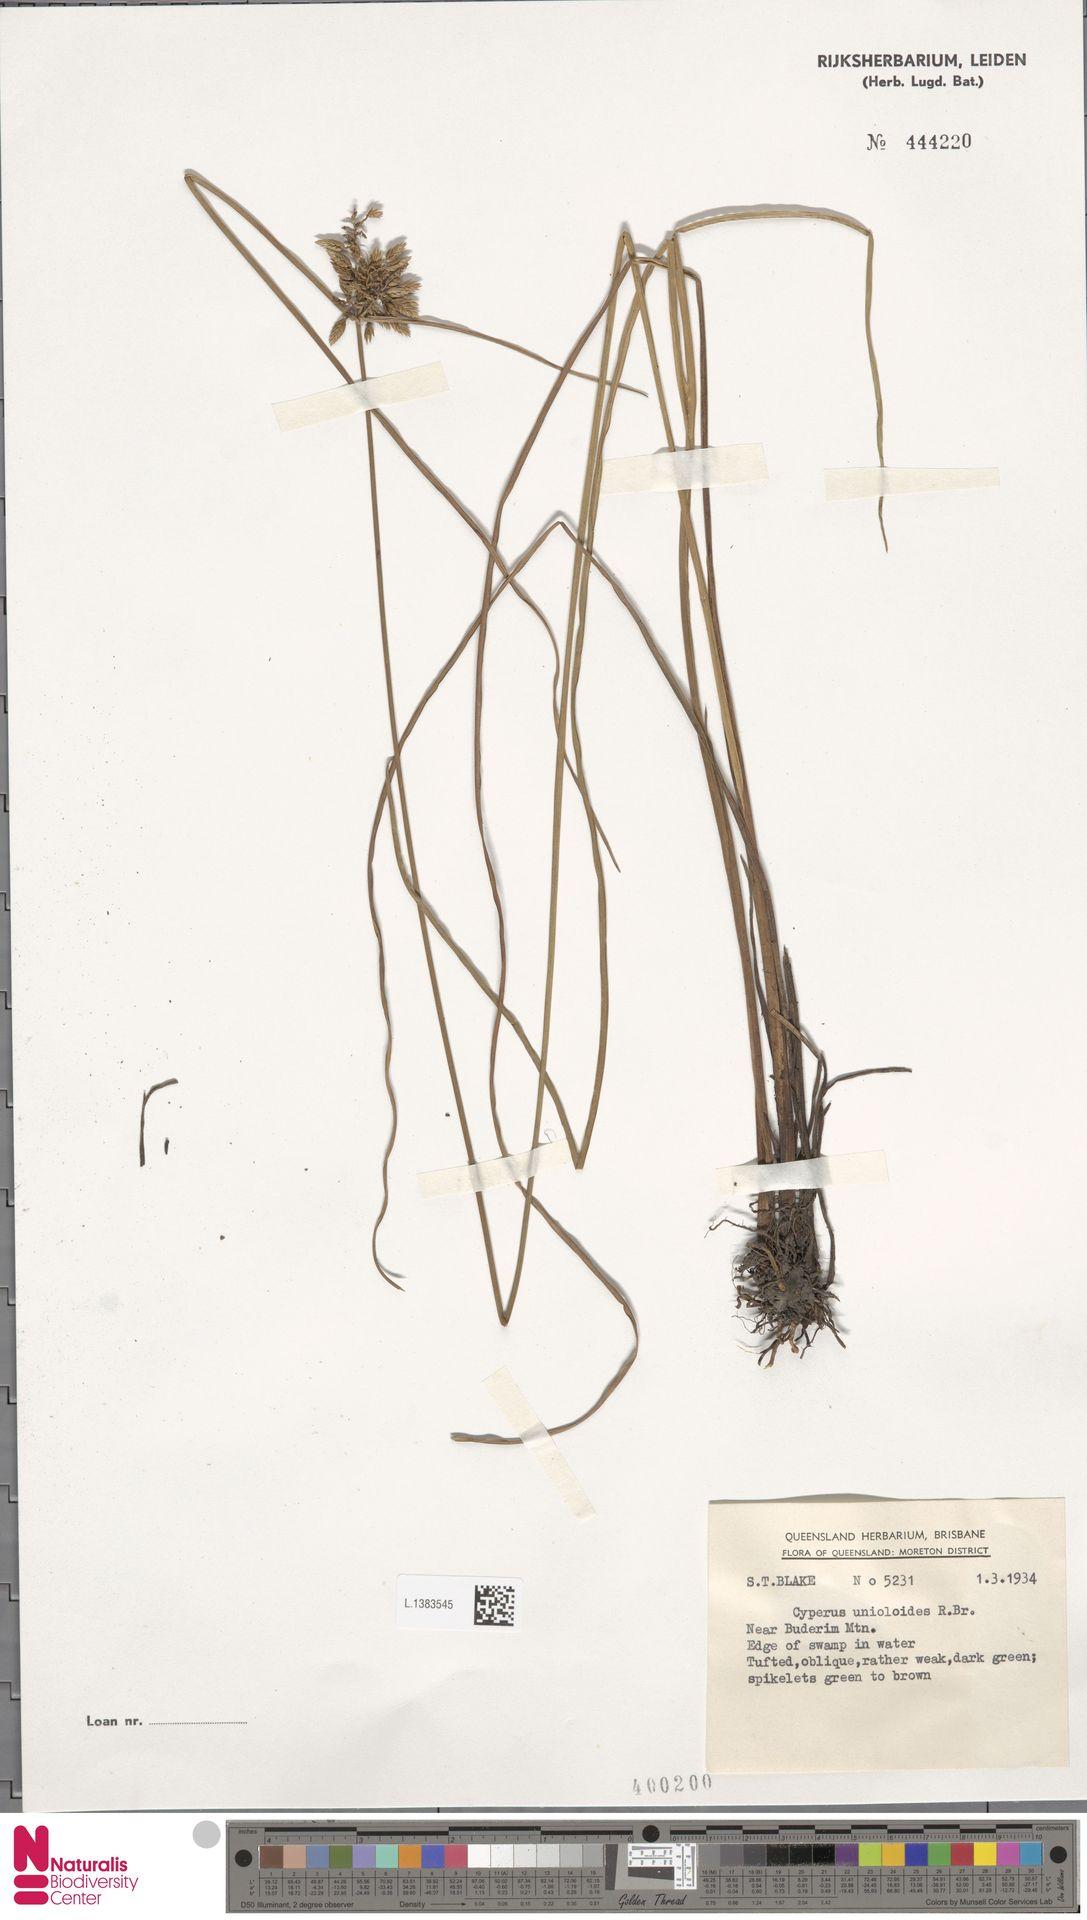 L.1383545 | Cyperus unioloides R.Br.